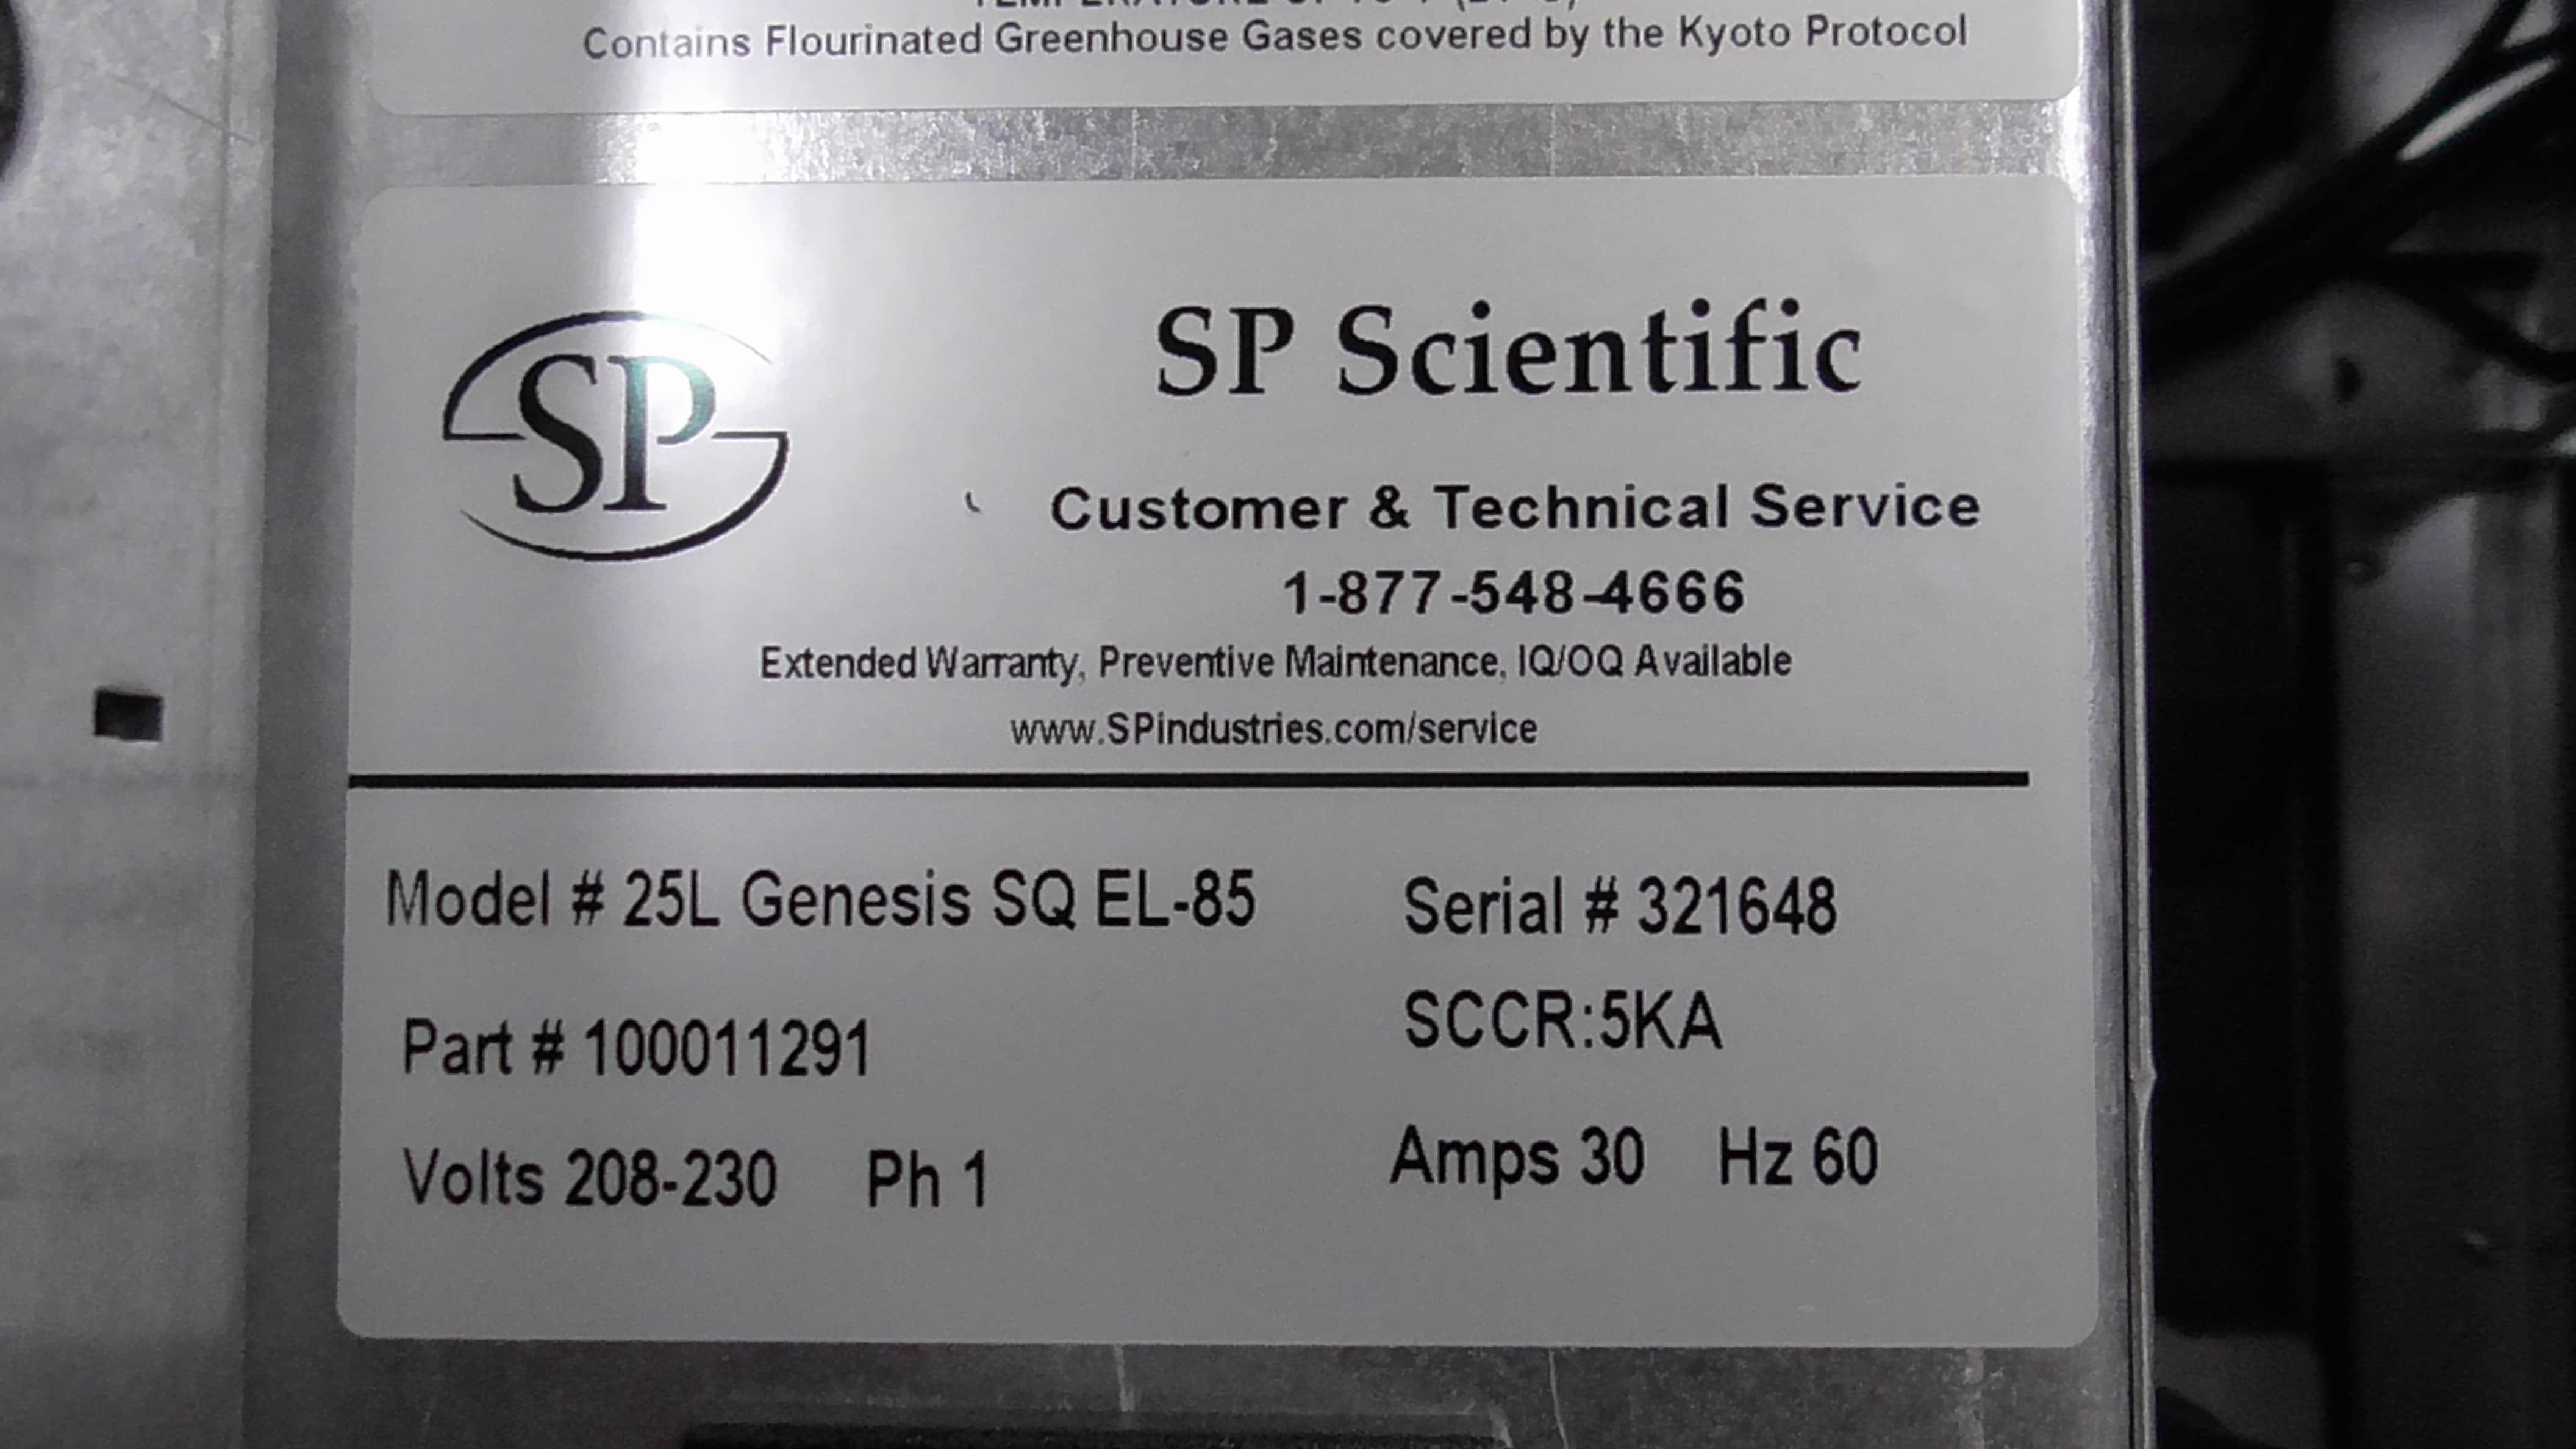 SP Scientific Virtis 25L Genesis SQ EL -85 (Part # 100011291)